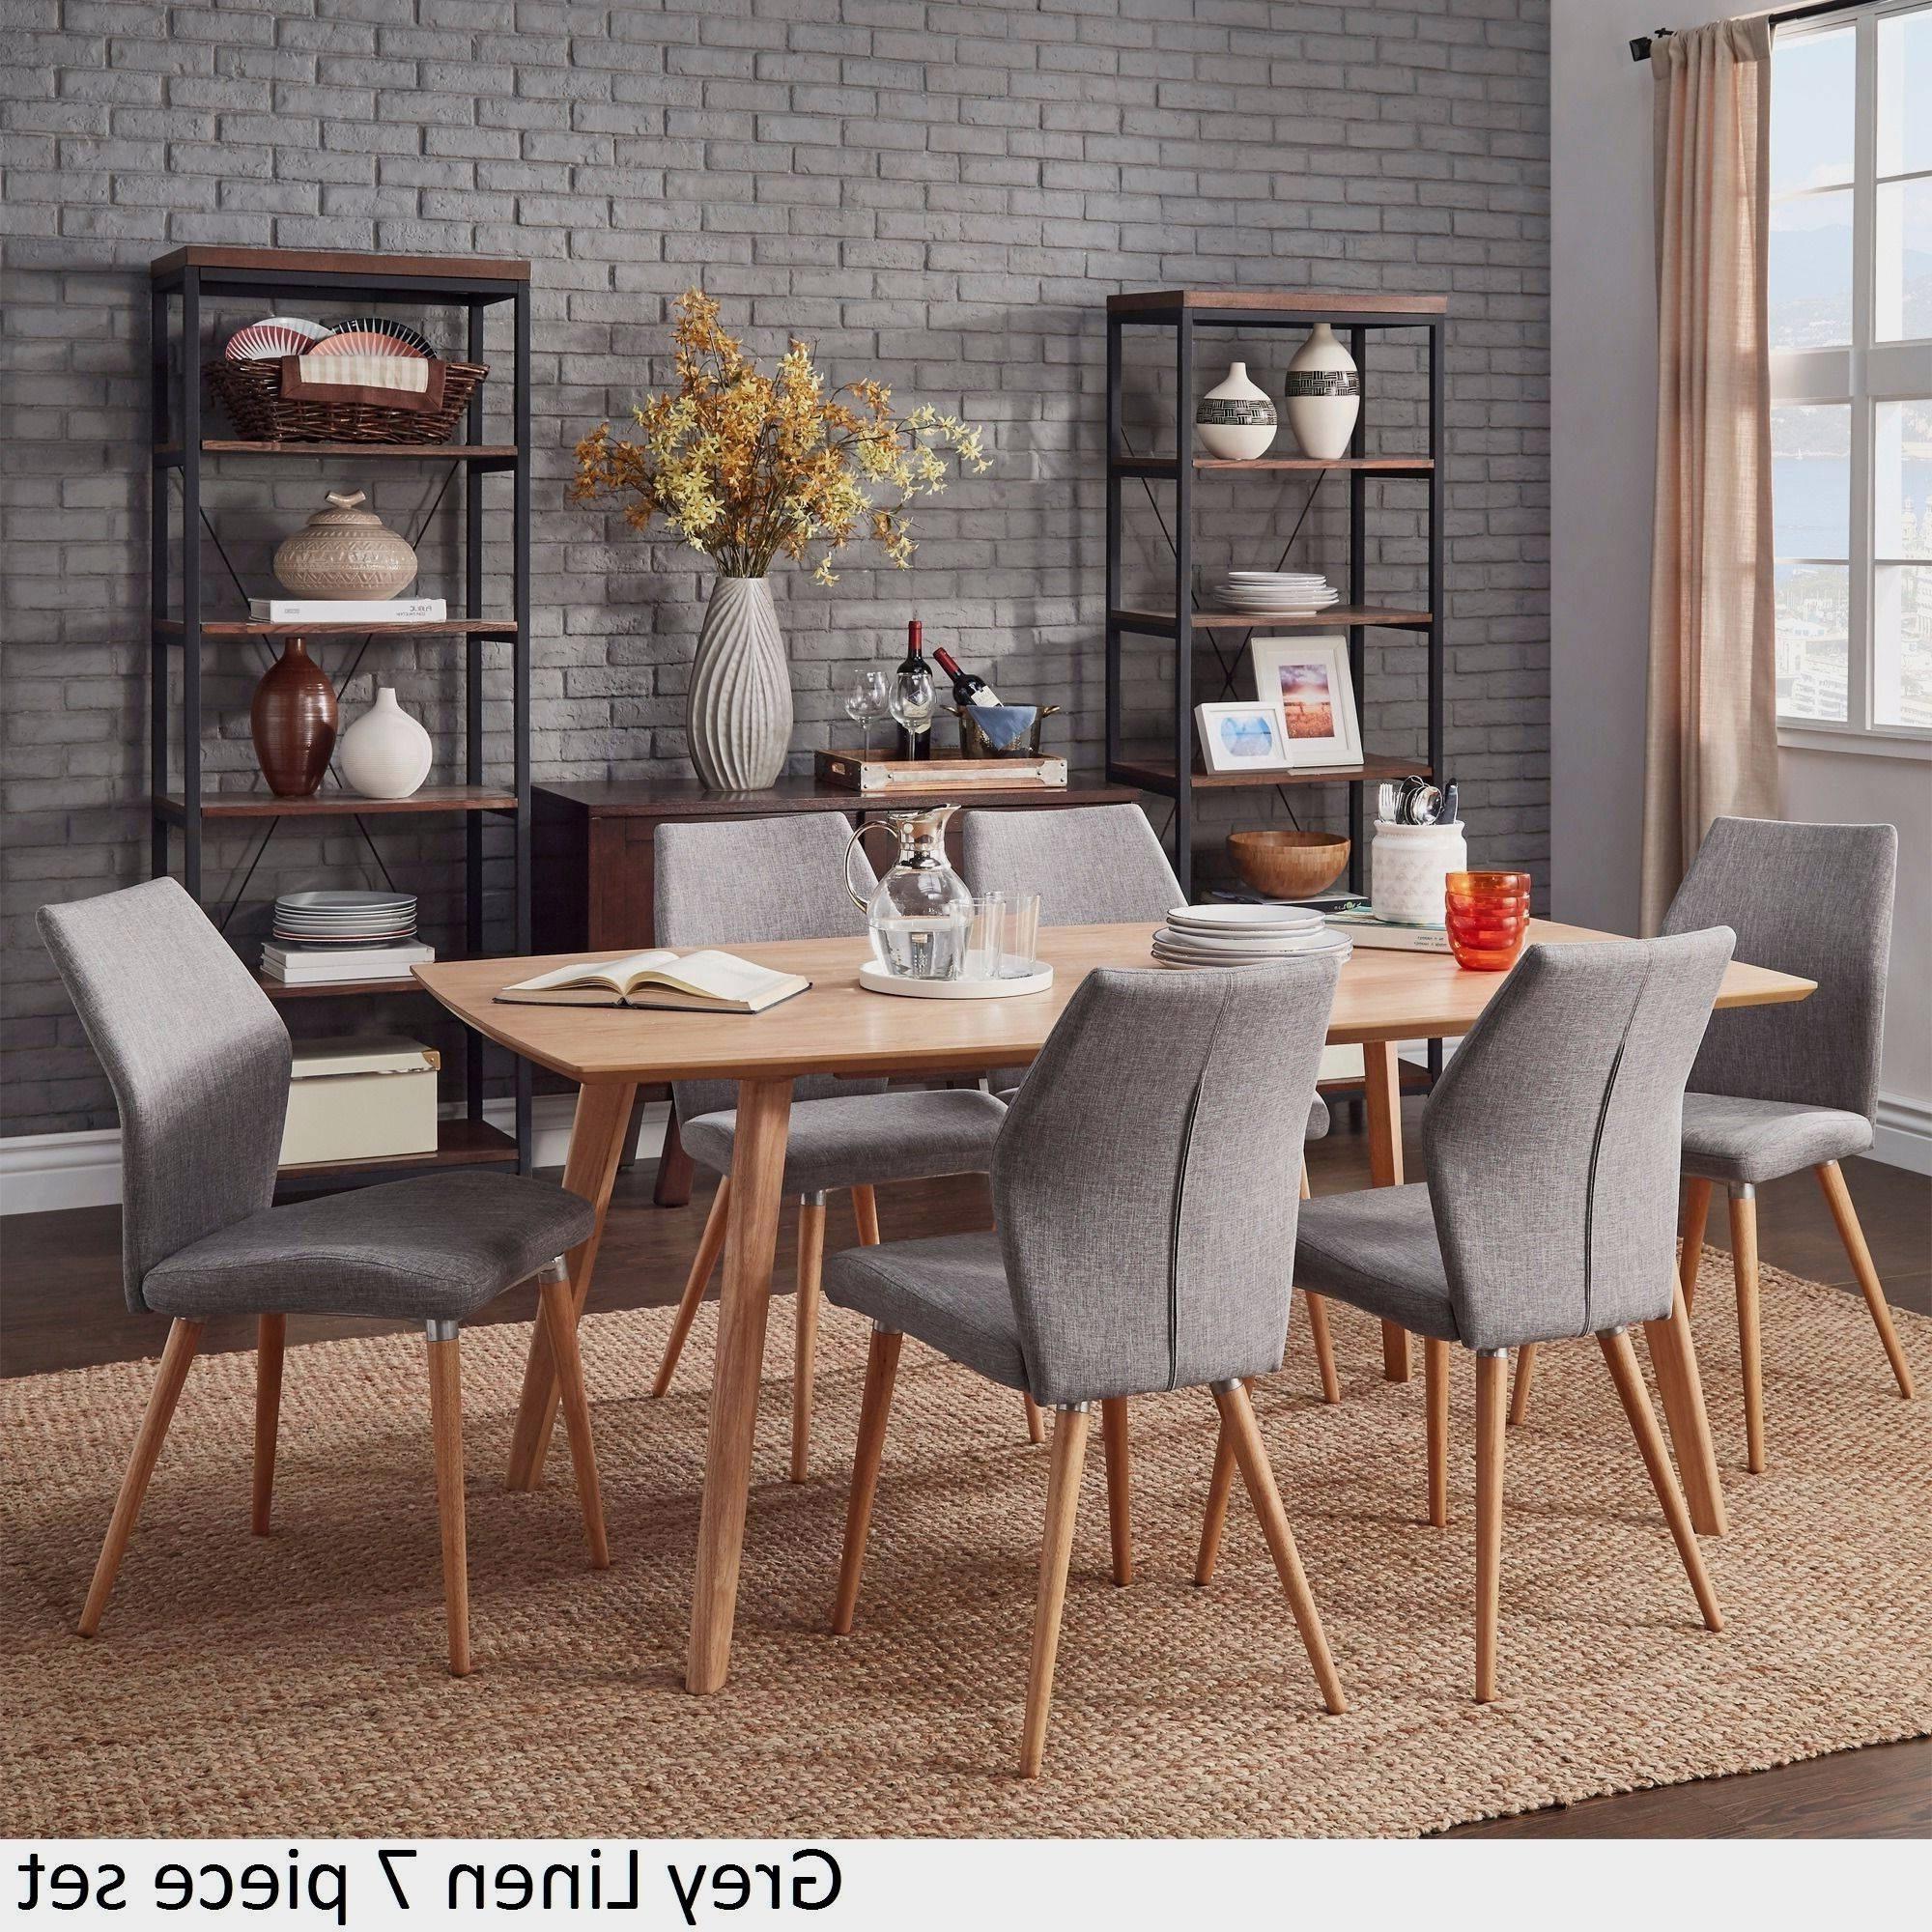 2019 Kirkland Patio Umbrellas Regarding At Home Patio Furniture Unique At Home Design Inspirational Wall (View 12 of 20)